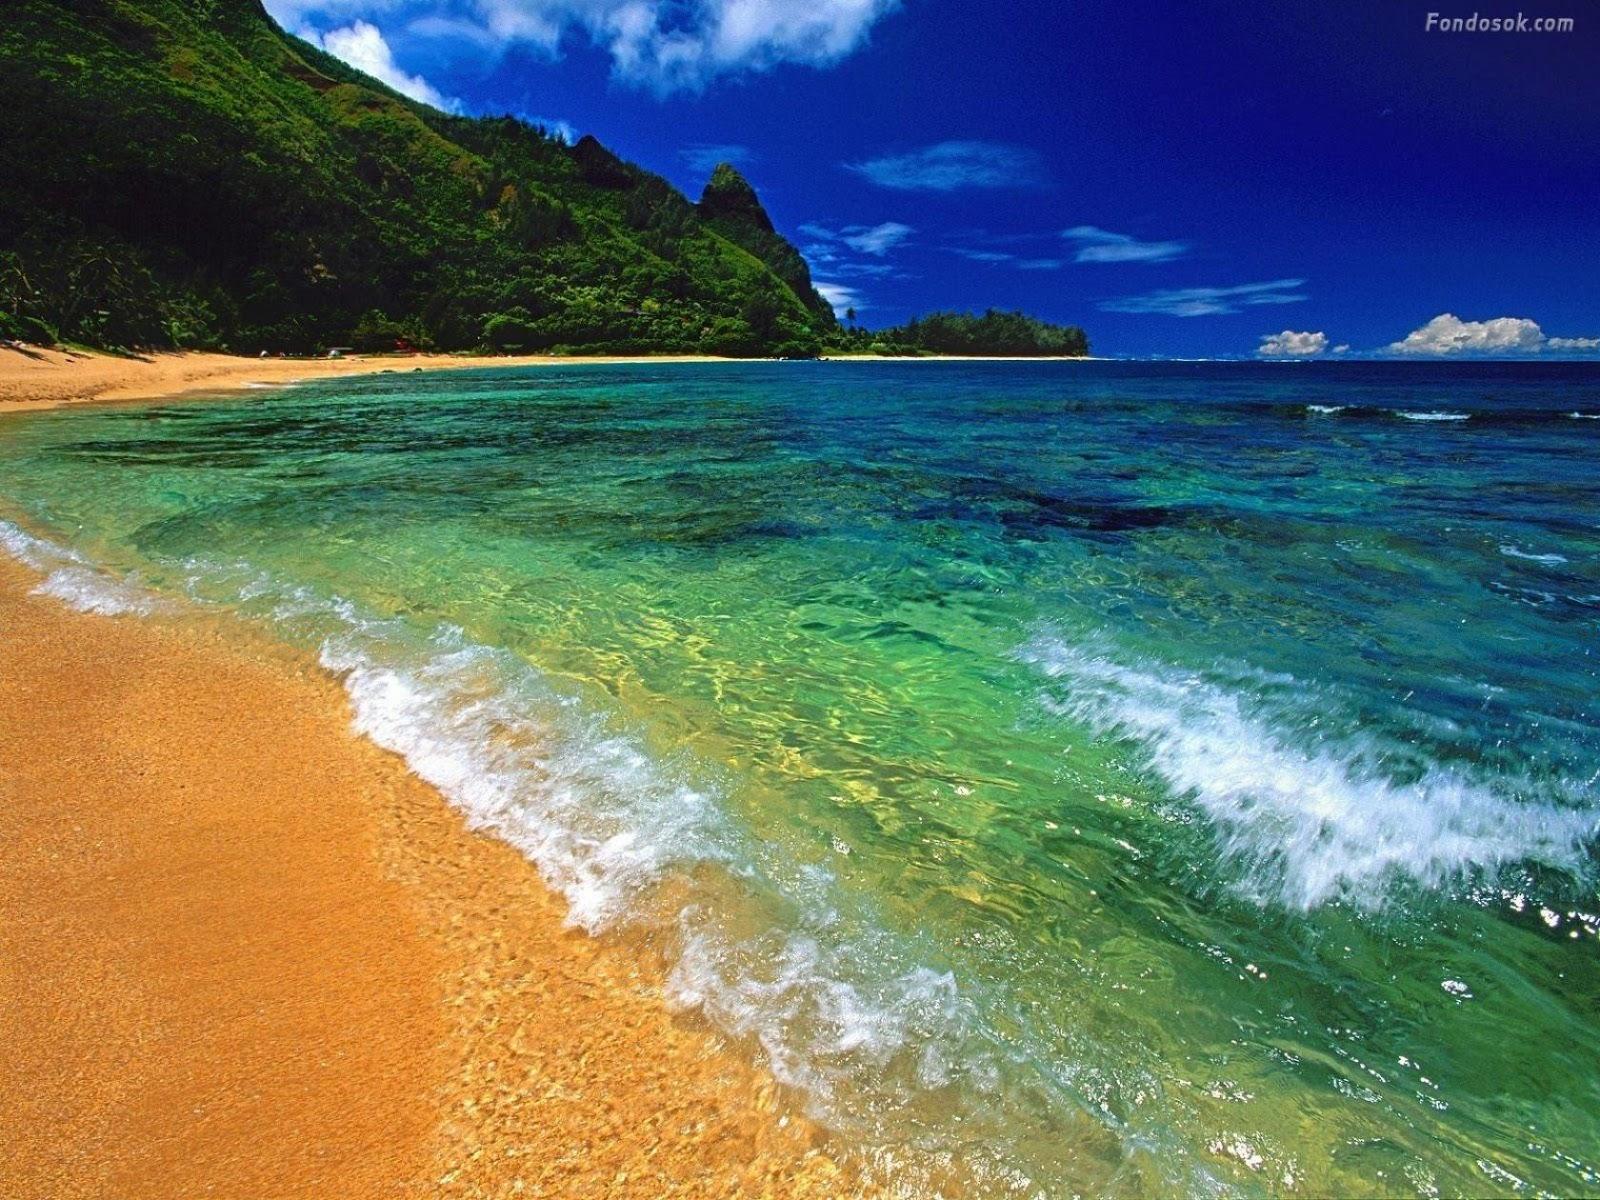 hd wallpaper hd beach wallpapers 1080p 1600x1200